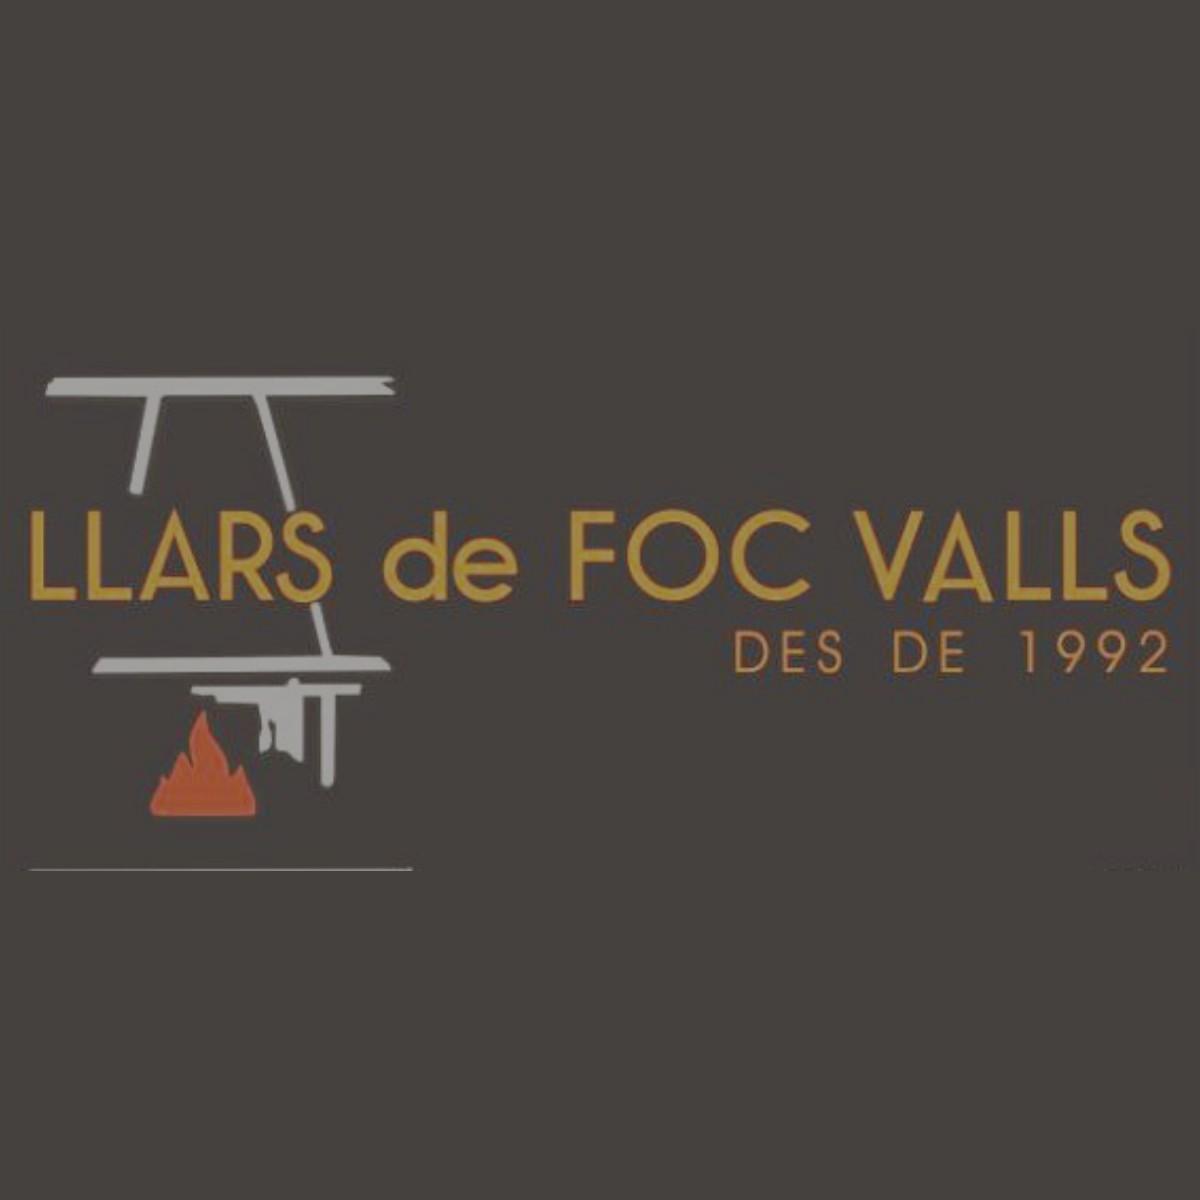 Llars De Foc Valls